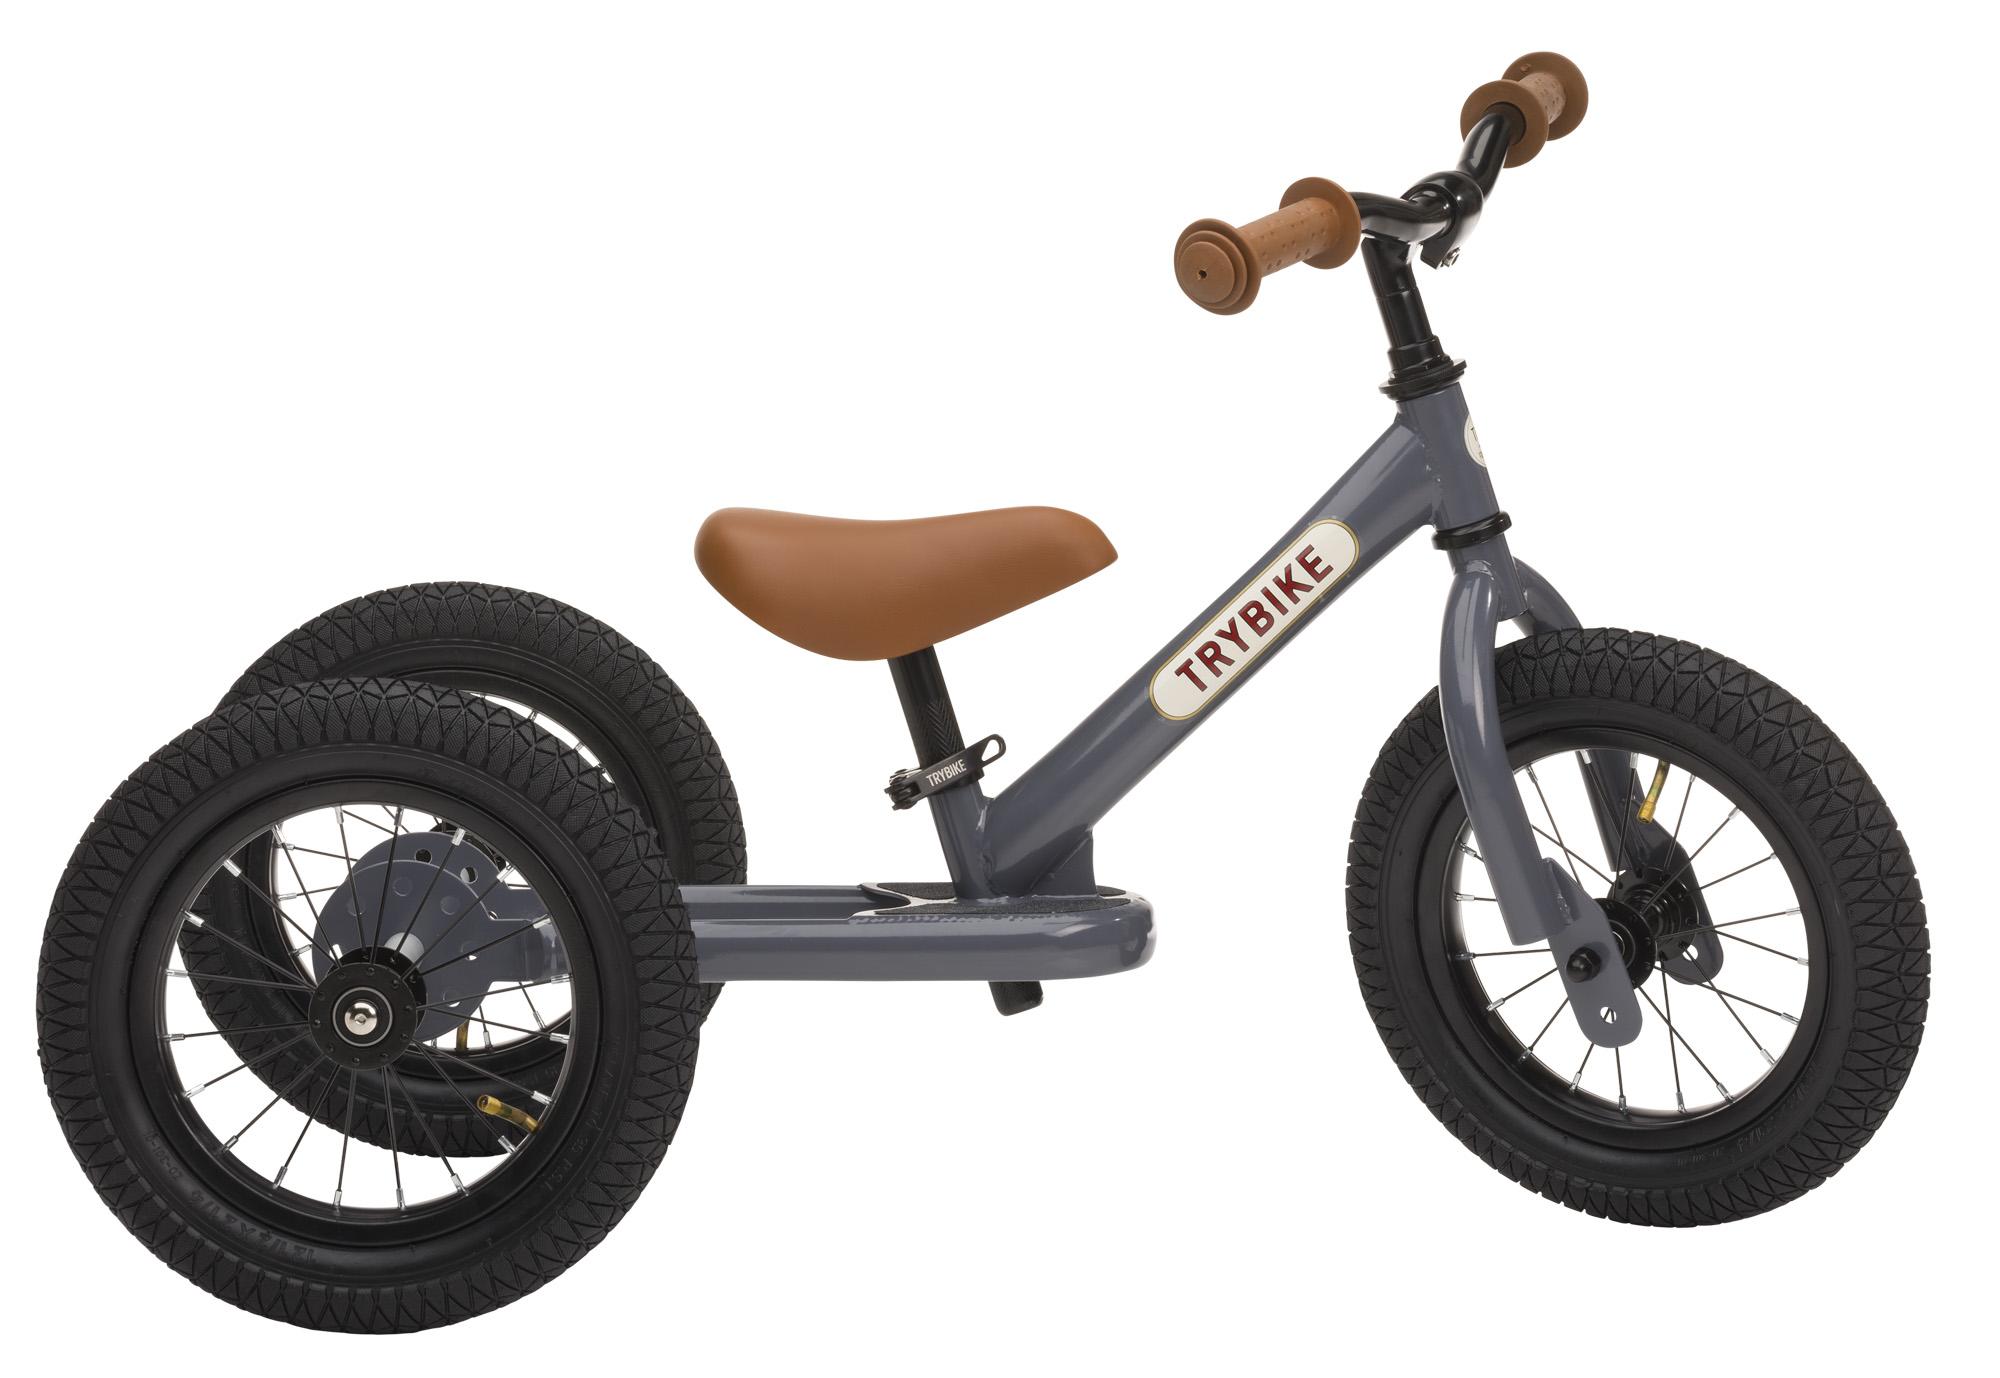 TRYBIKE steel 2 in 1 balance bike - grey/brown